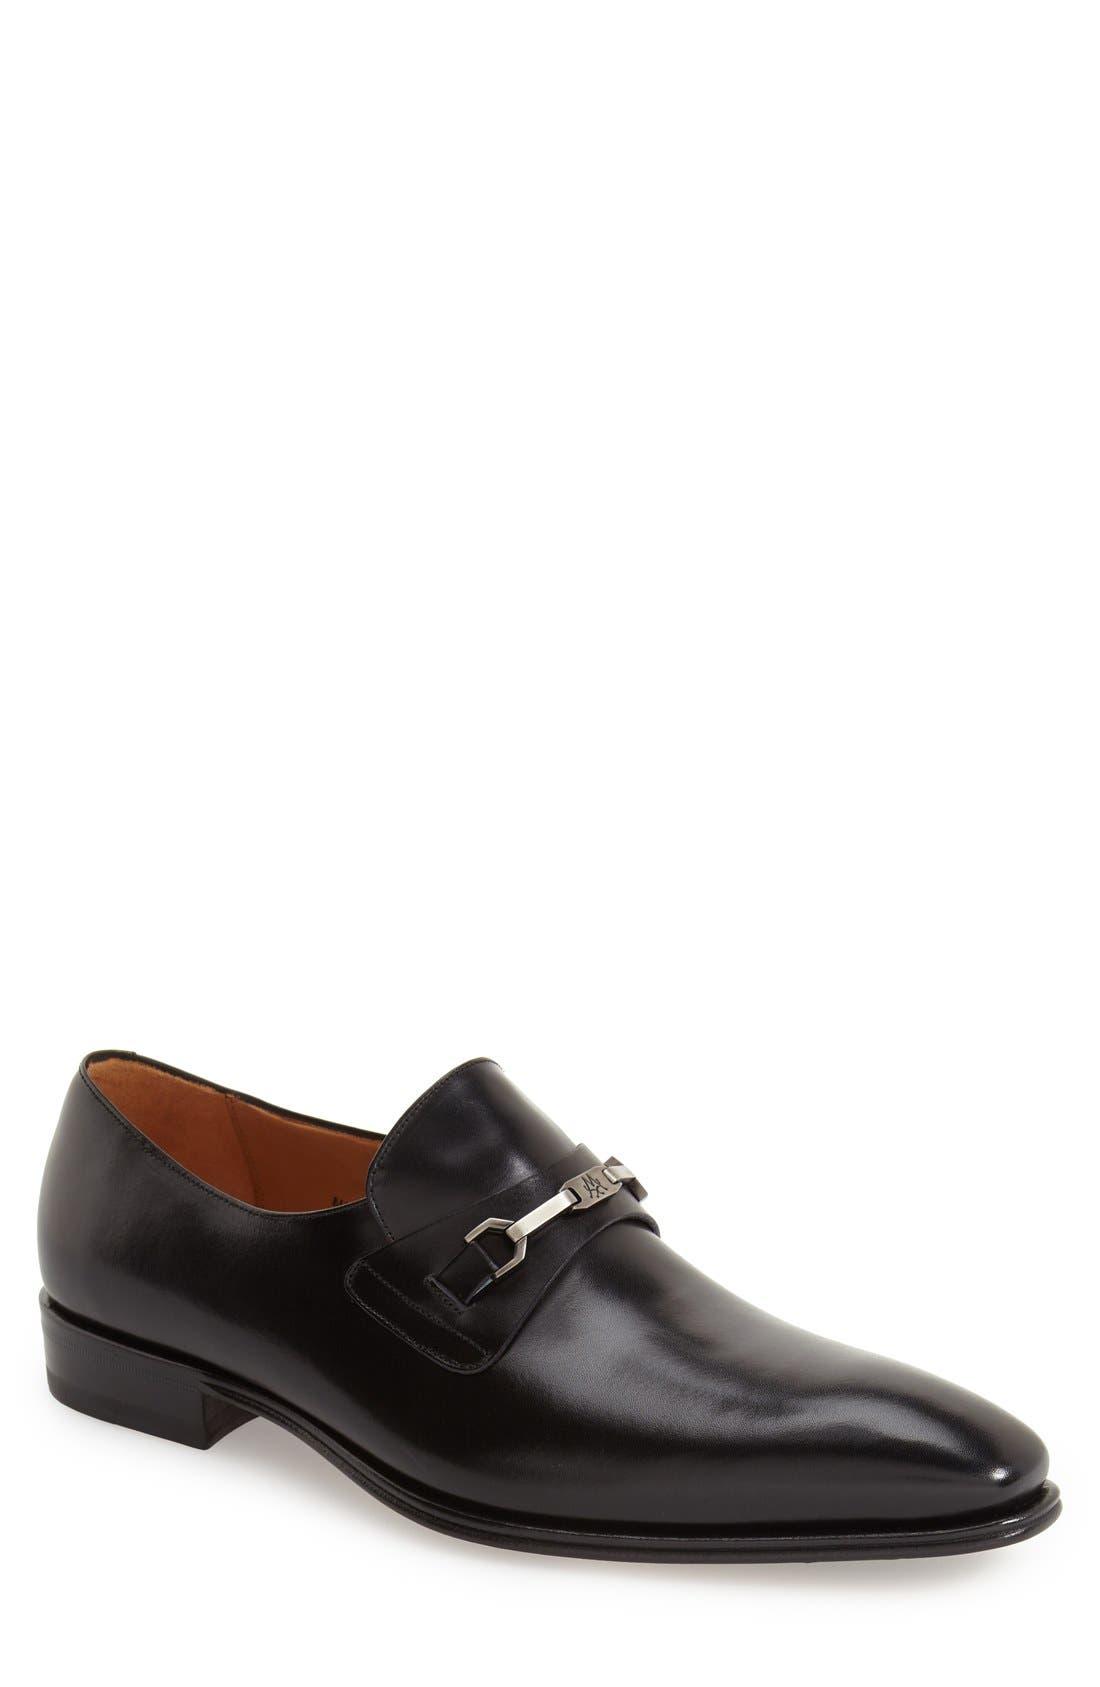 'Doria' Venetian Loafer,                             Main thumbnail 1, color,                             Black